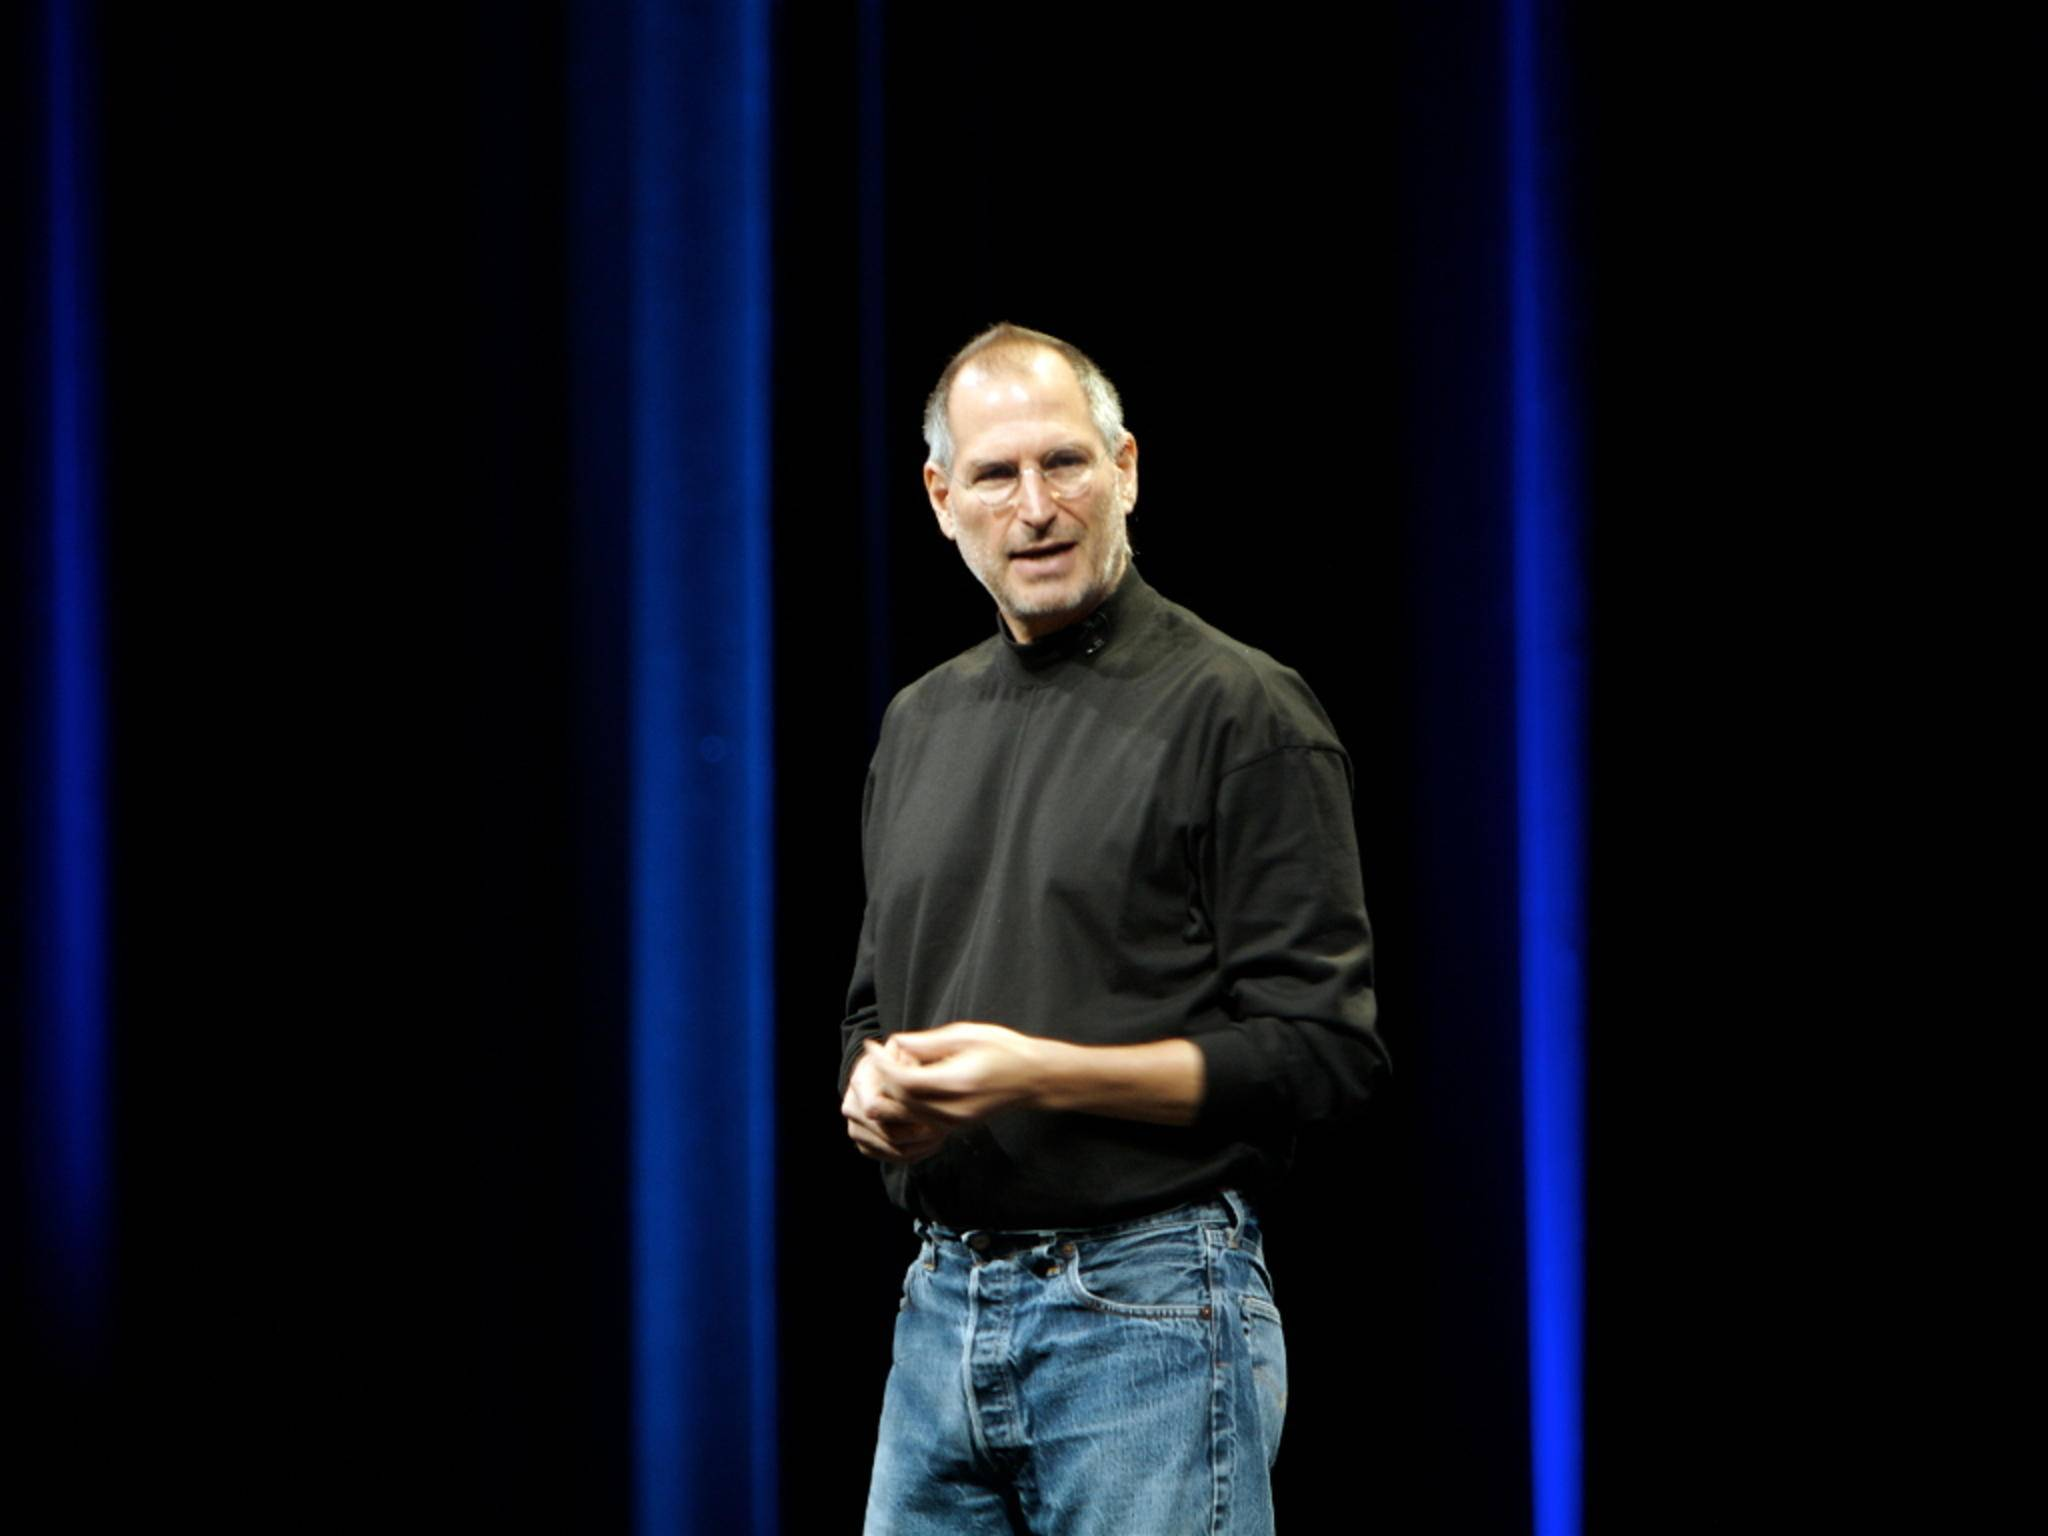 Steve Jobs erfand viel - allerdings nicht die Apple Watch.